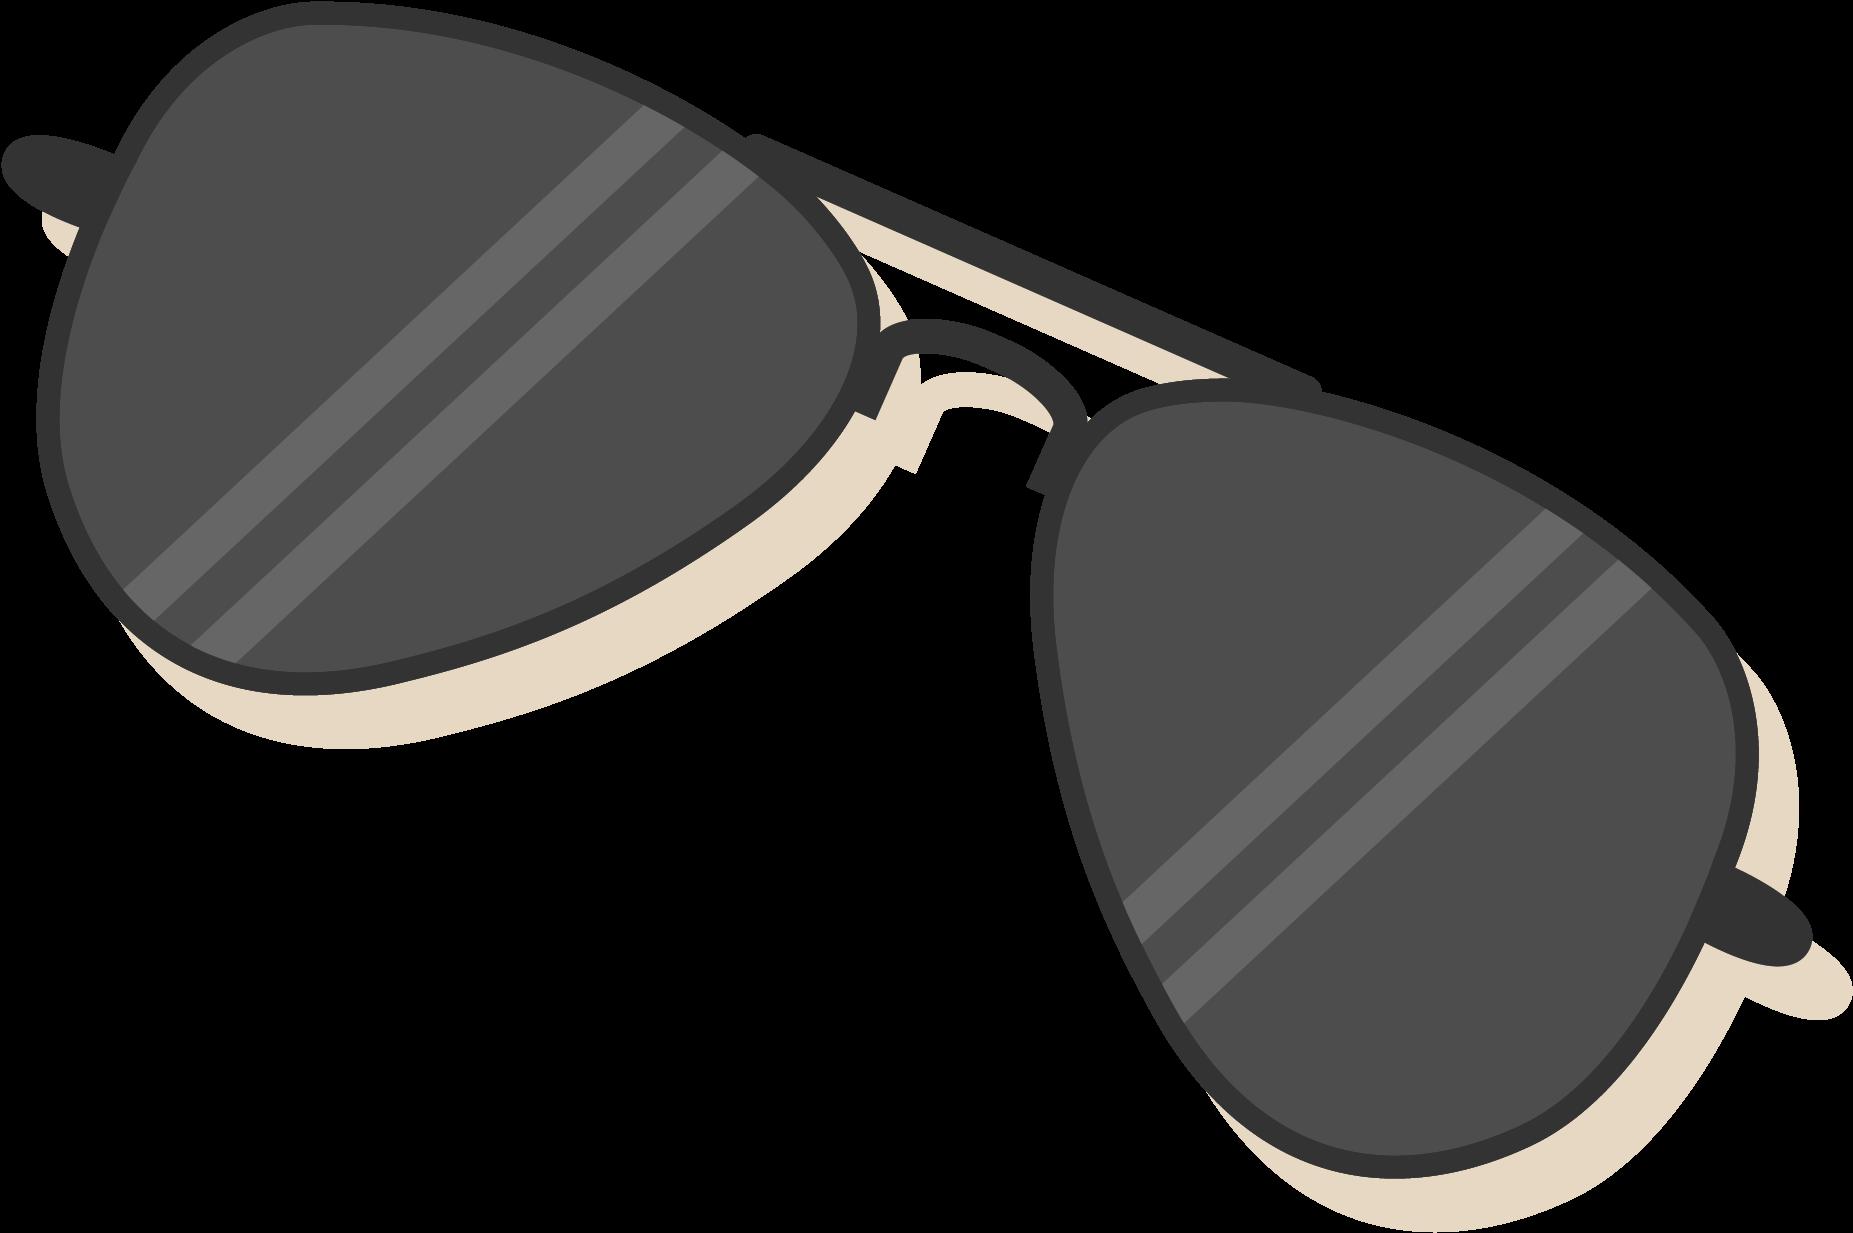 Cartoon sunglasses clipart.